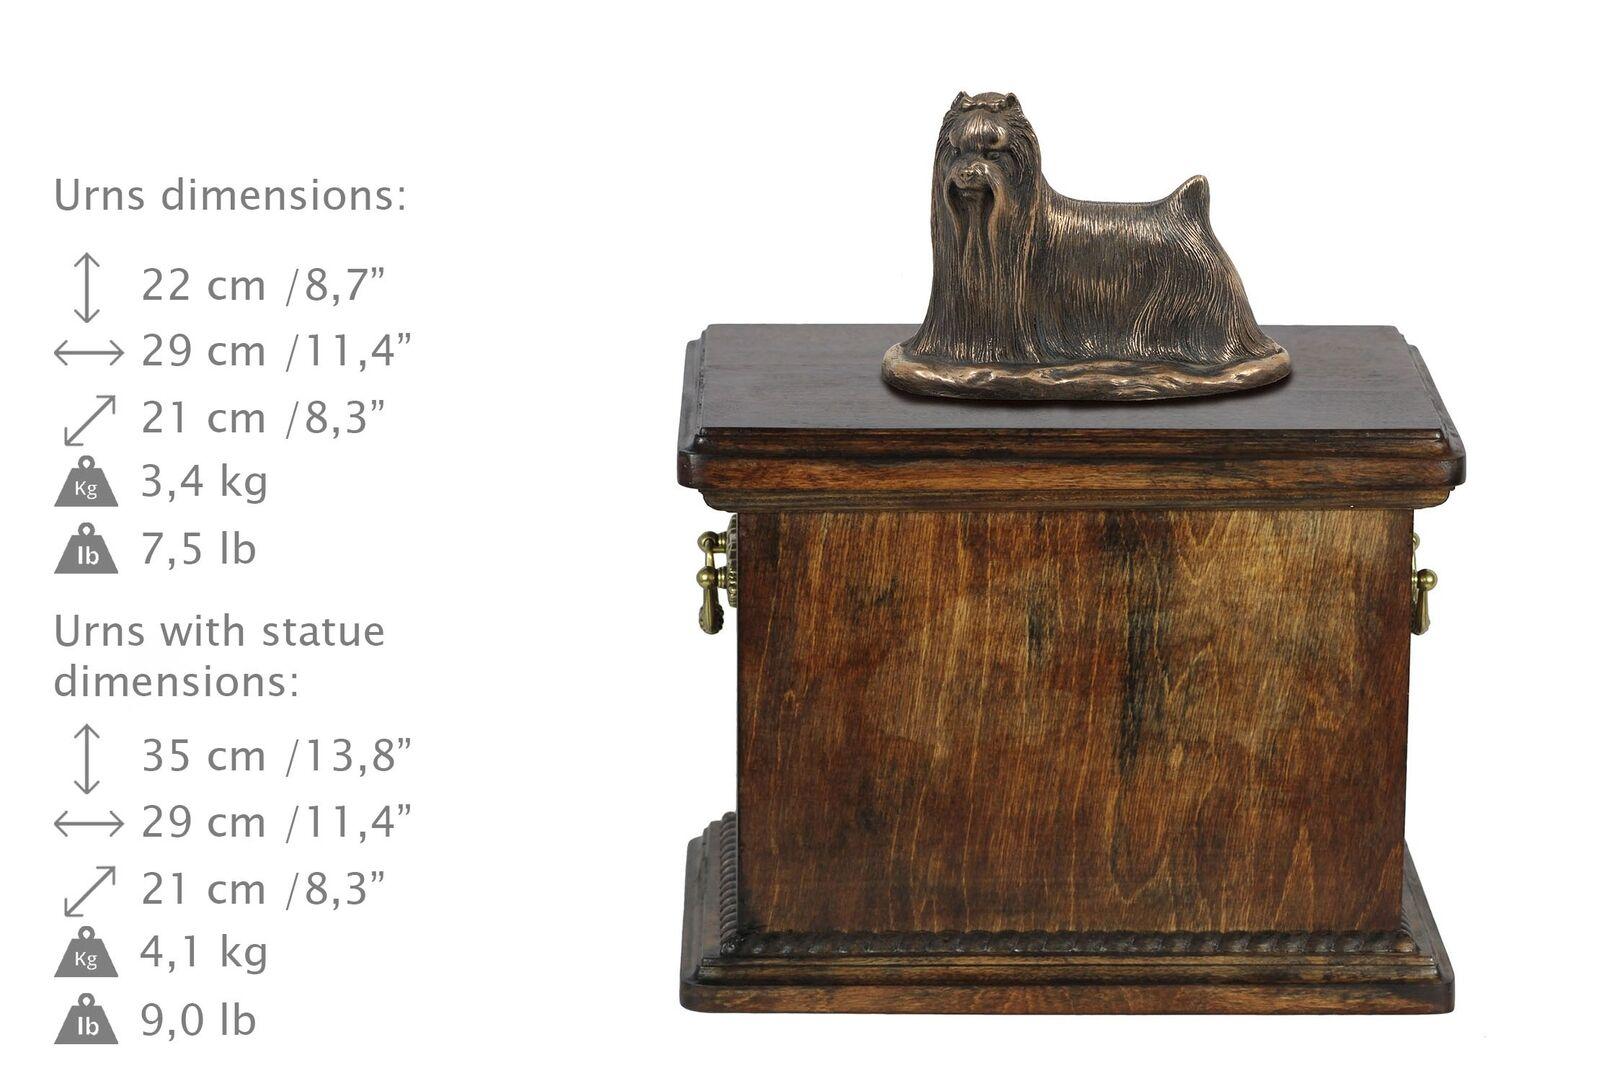 Yorkshire Terrier - wooden urn with dog statue, Art Art Art Dog type 1 3c15d5